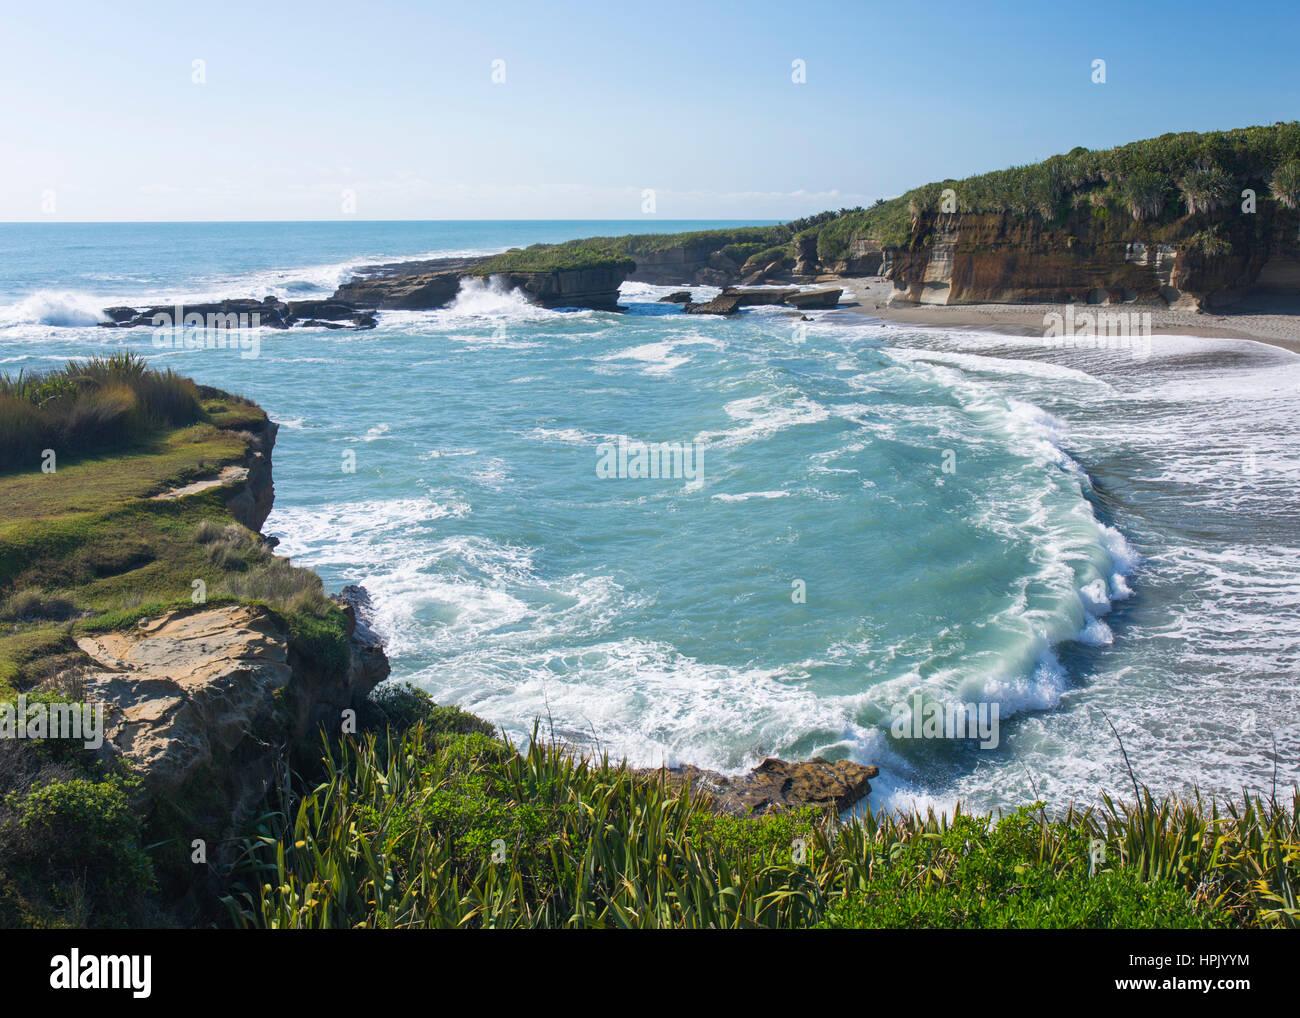 Punakaiki, Paparoa National Park, West Coast, New Zealand. Waves from the Tasman Sea pounding secluded beach at - Stock Image